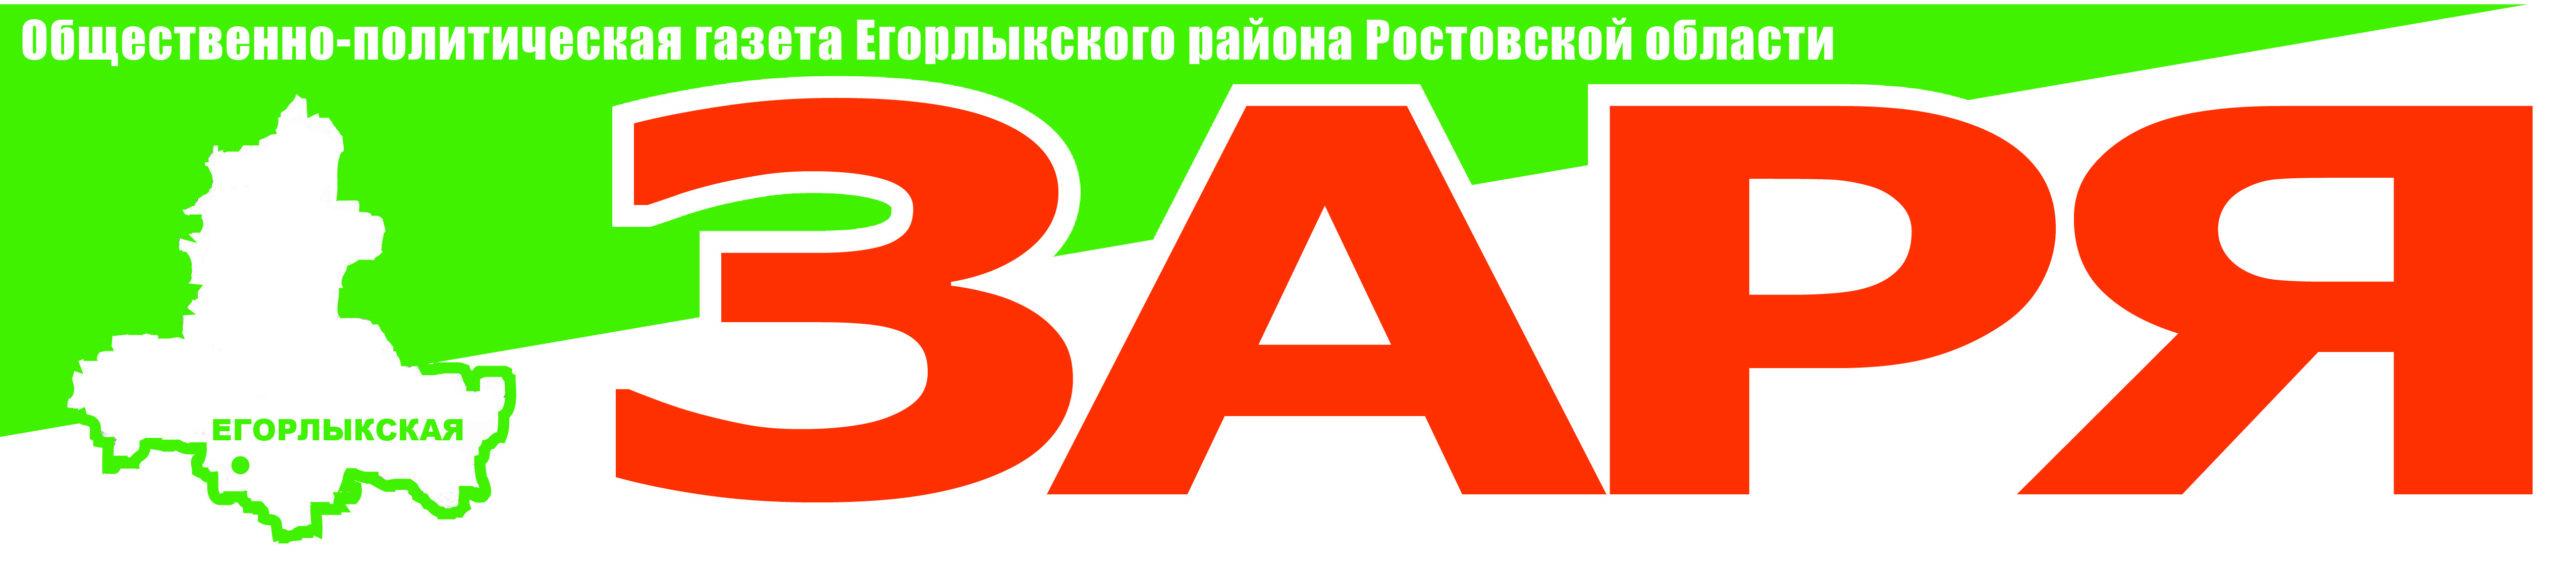 Подпишись на газету «Зарю» онлайн!